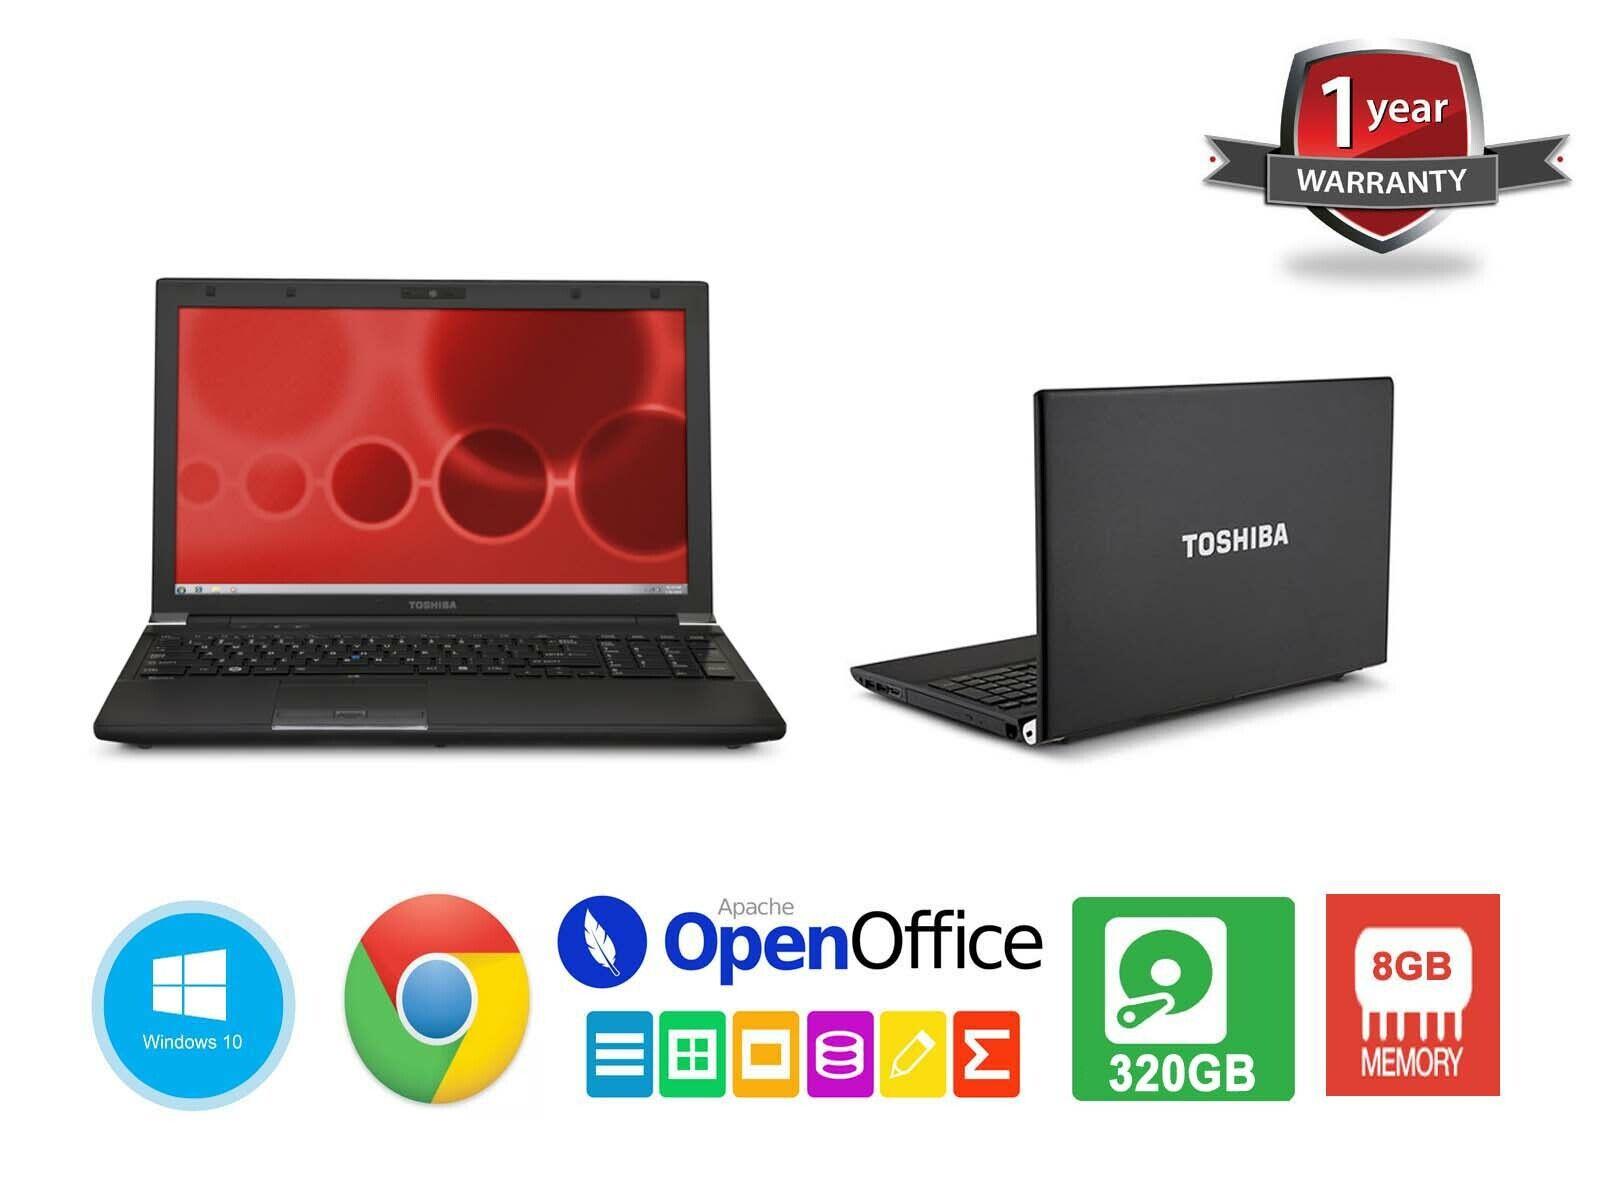 Cheap Toshiba 15.6″ Laptop IntelCore i5 8GB RAM 200GB SSD Win10 WiFi HDMI WebCam